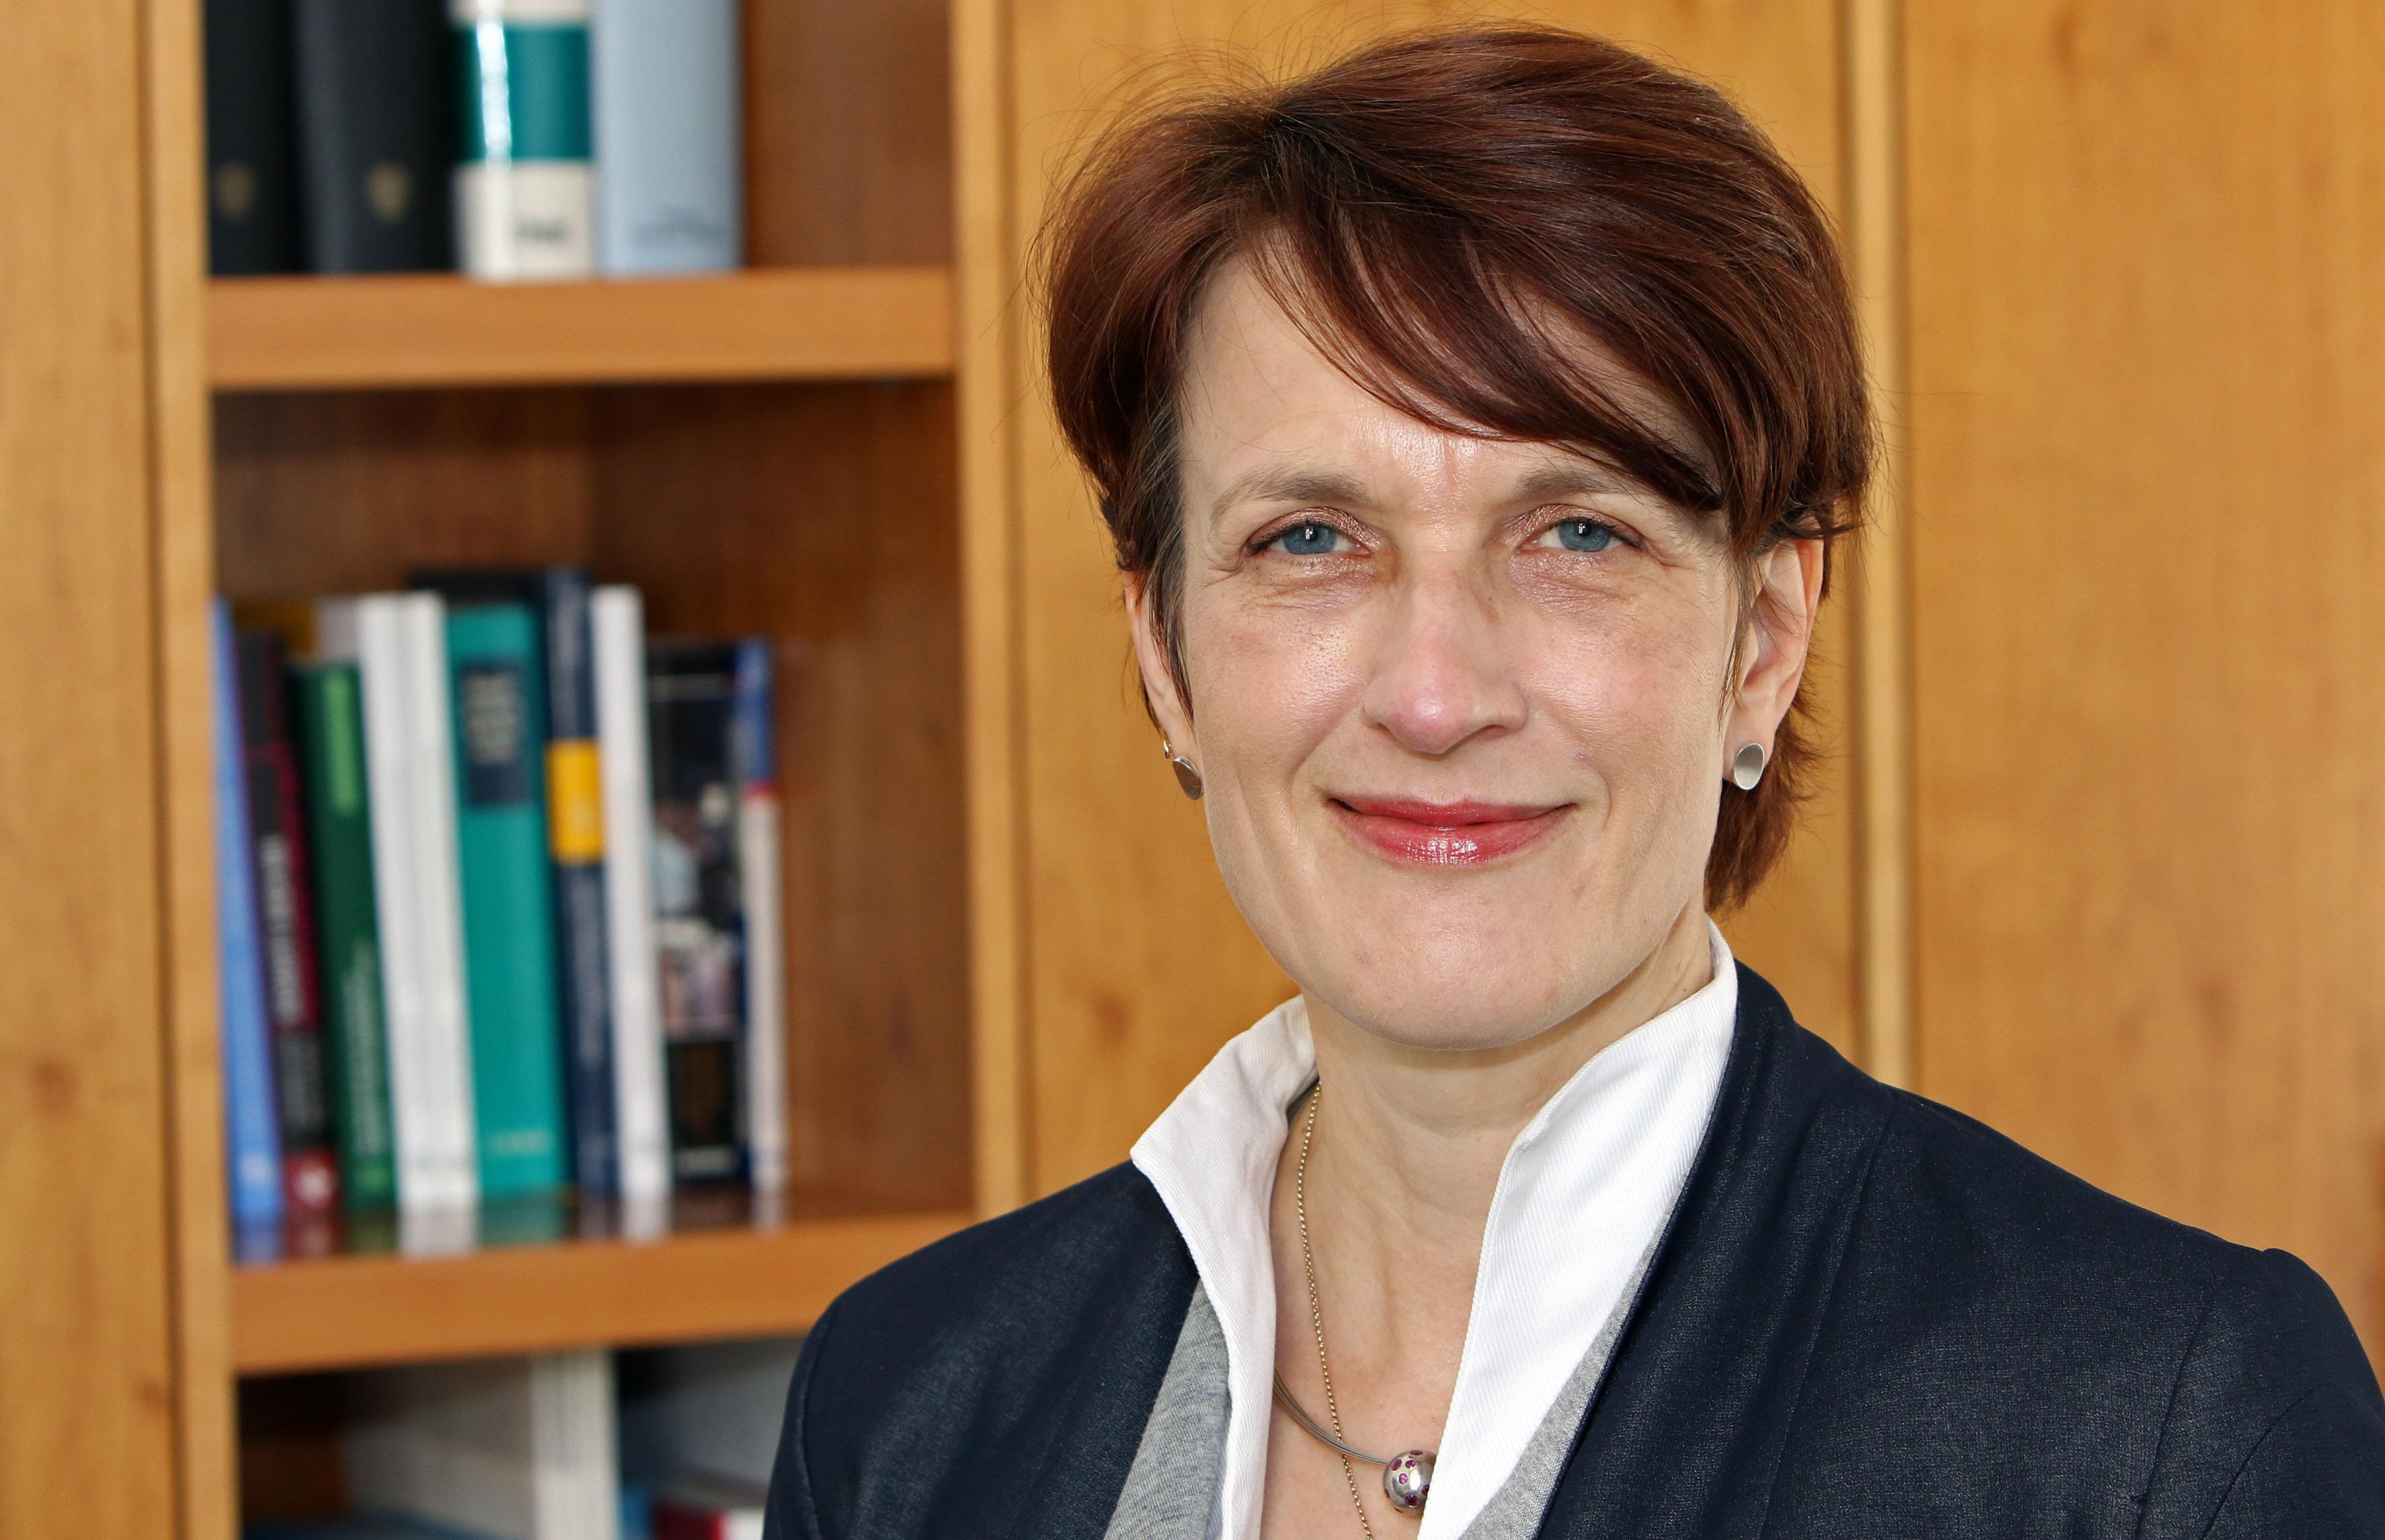 Astrid Kreil-Sauer